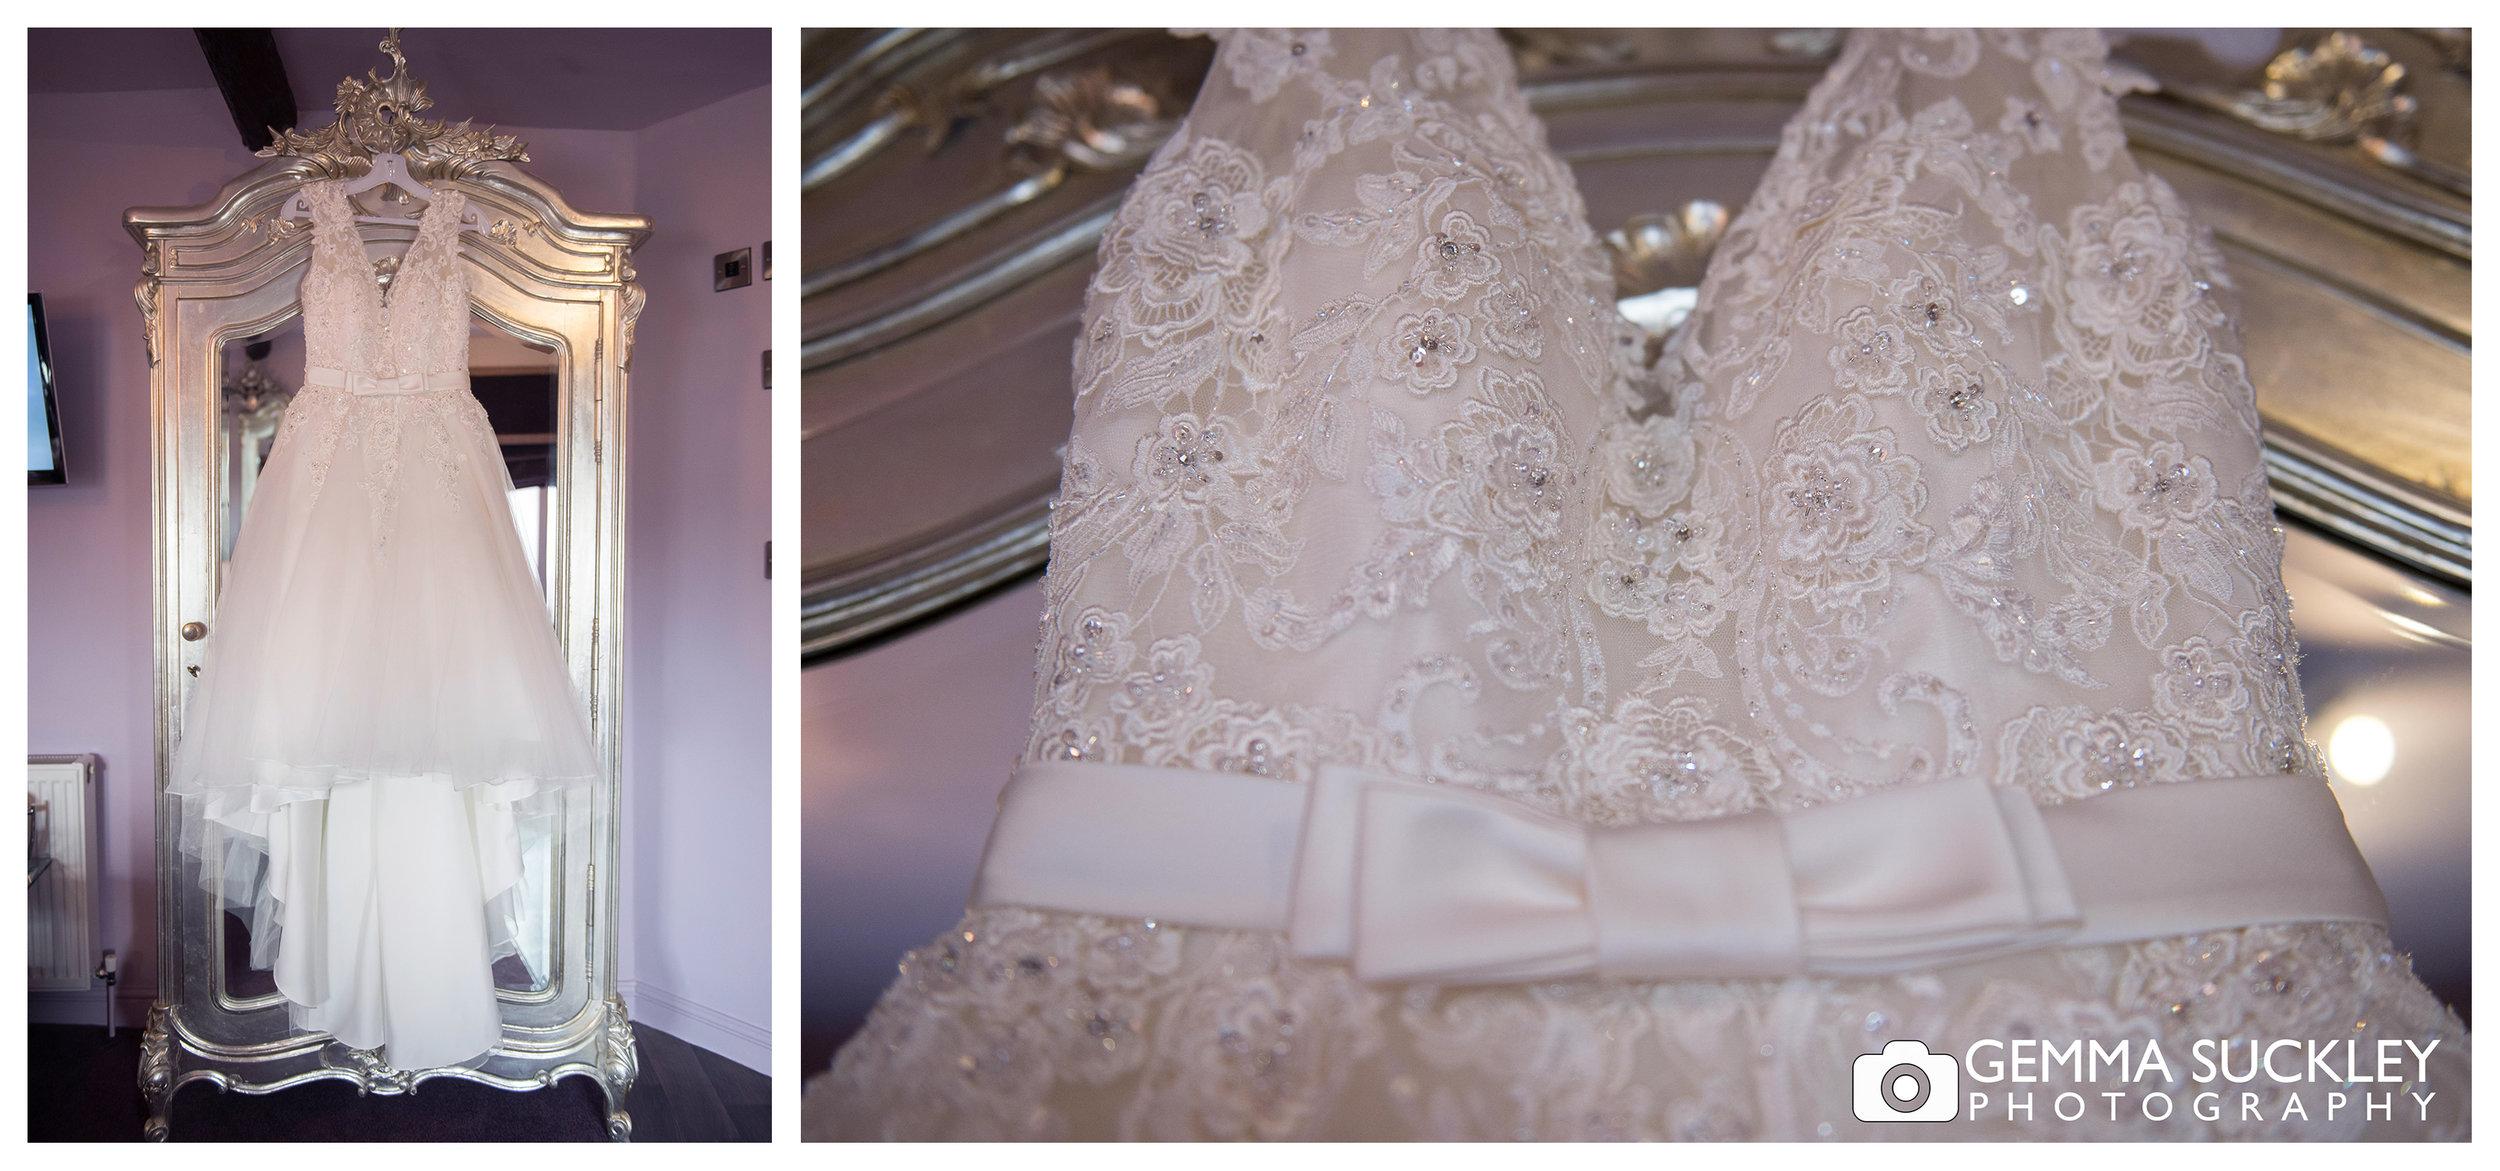 wedding photo of a amelias wedding dress hanging at grassington house